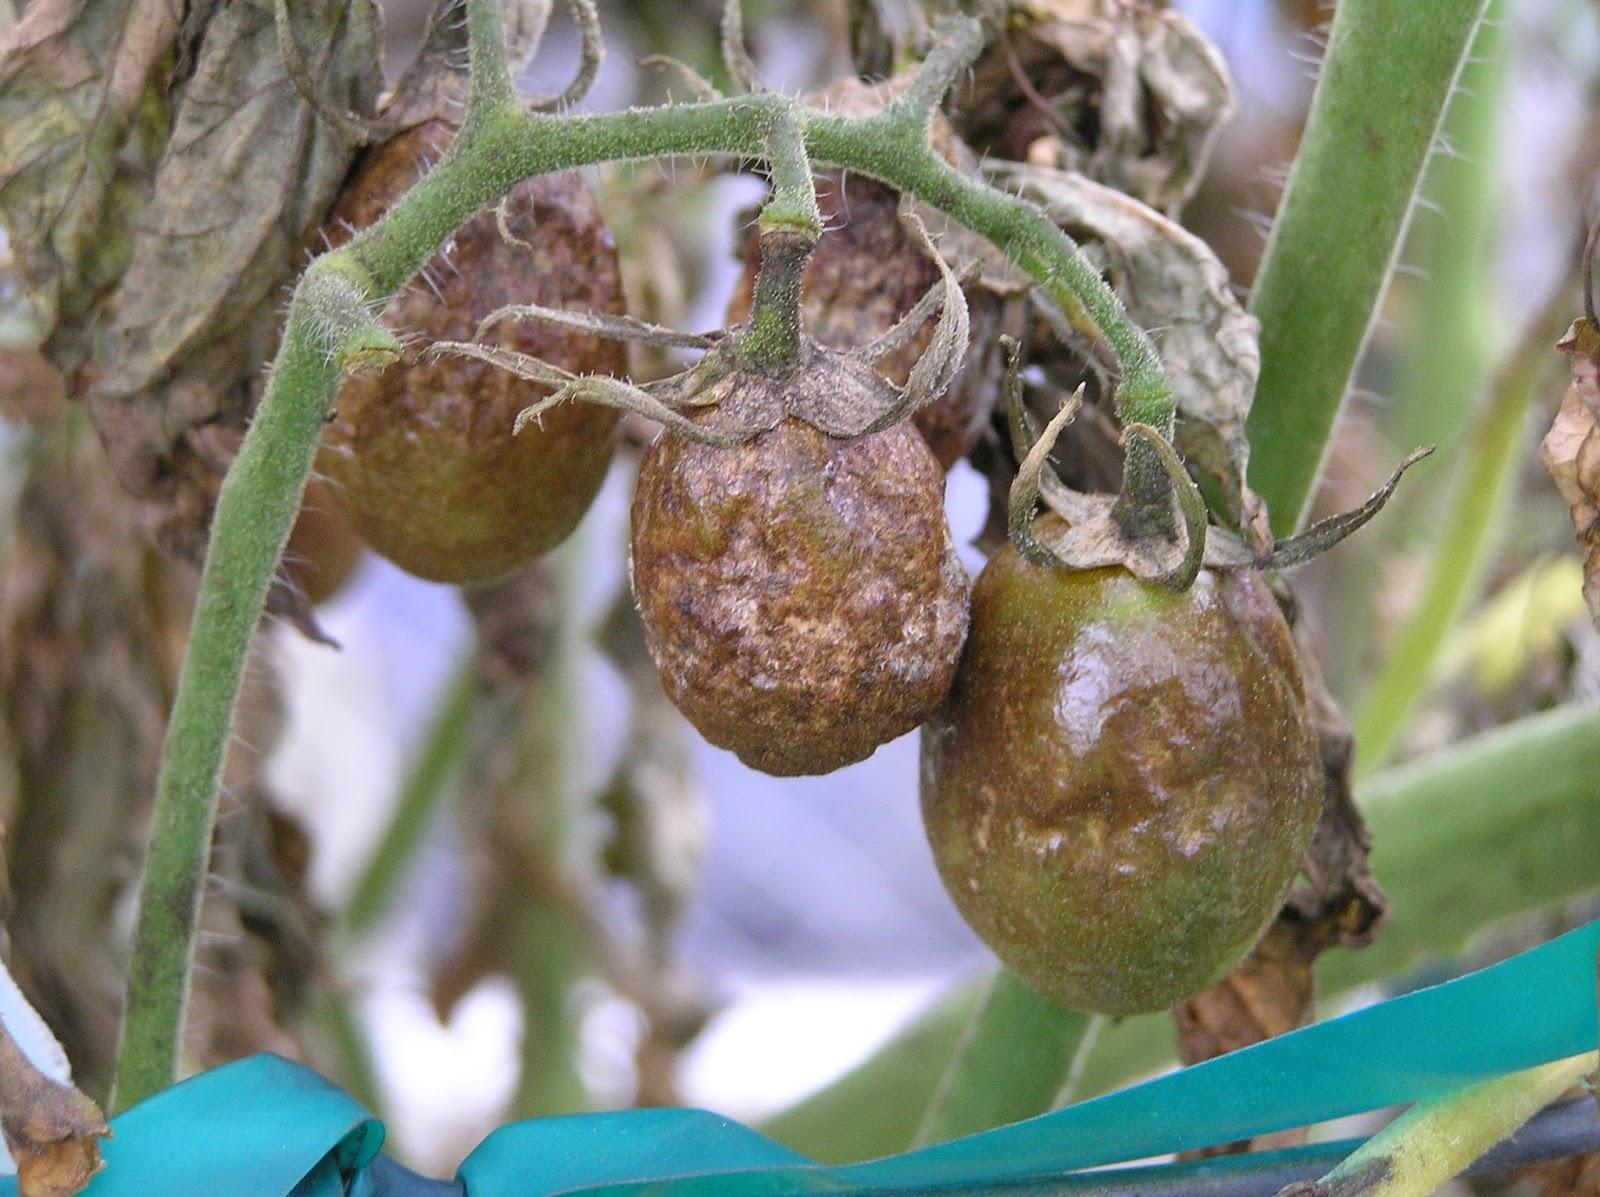 phytophthora tomaat moestuin volkstuin